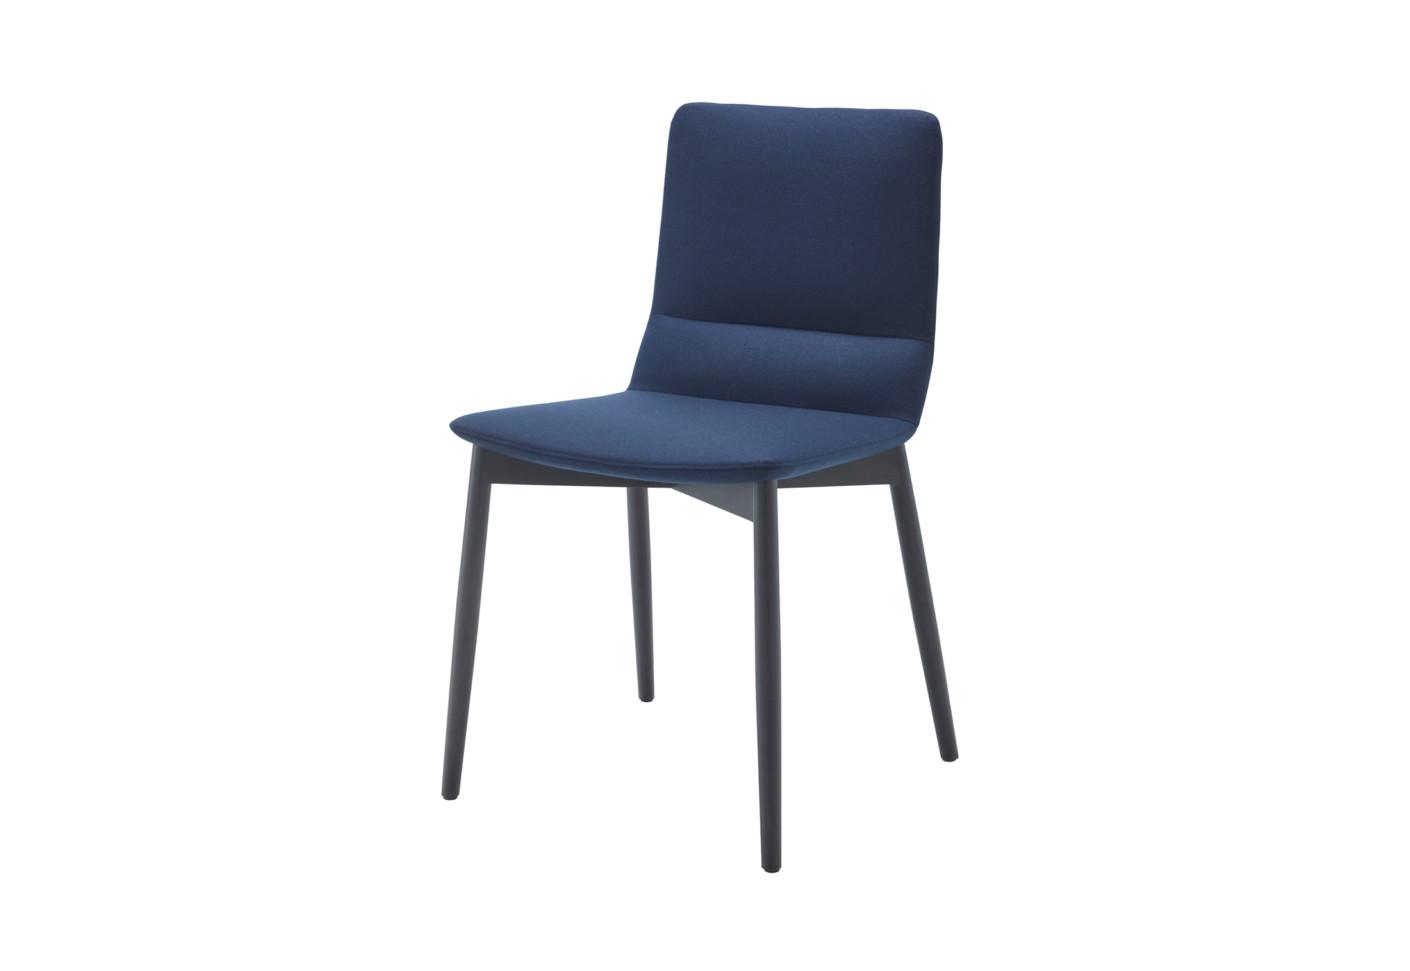 Bendchair With Legs By Ligne Roset Stylepark